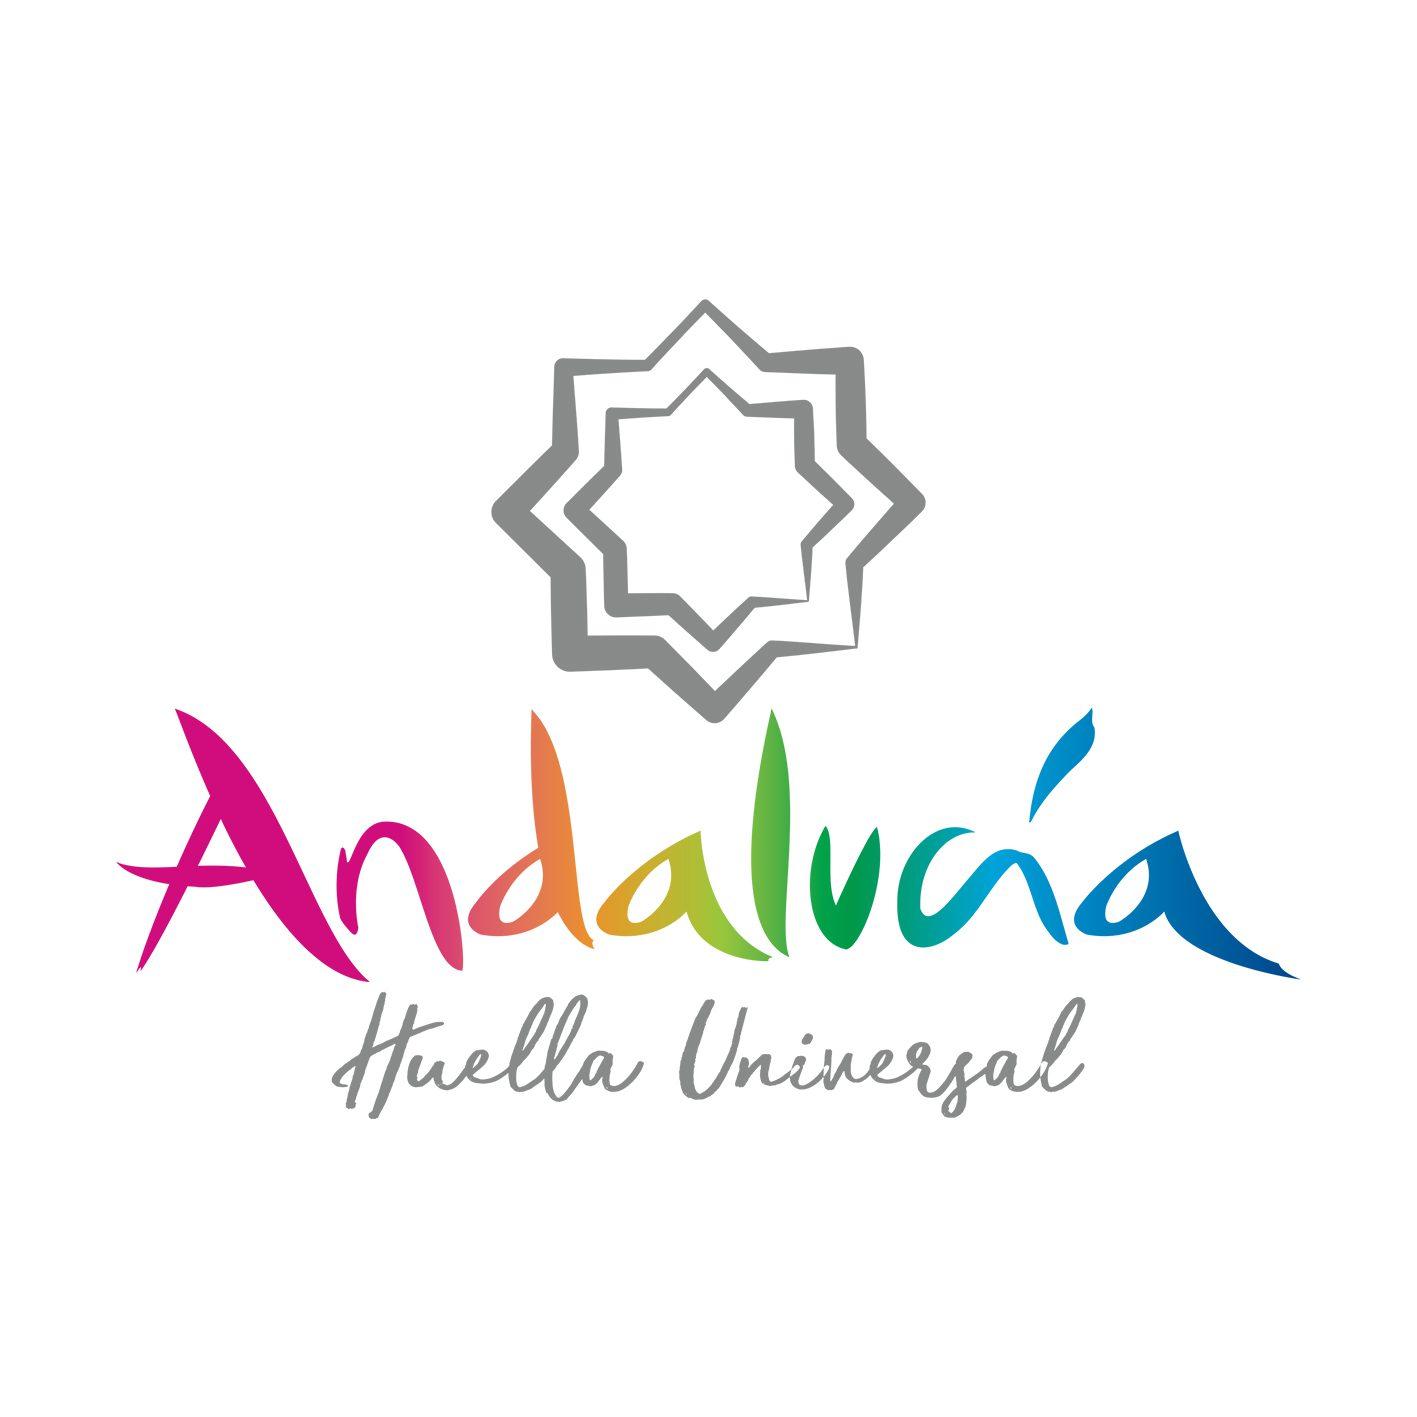 huella-universal